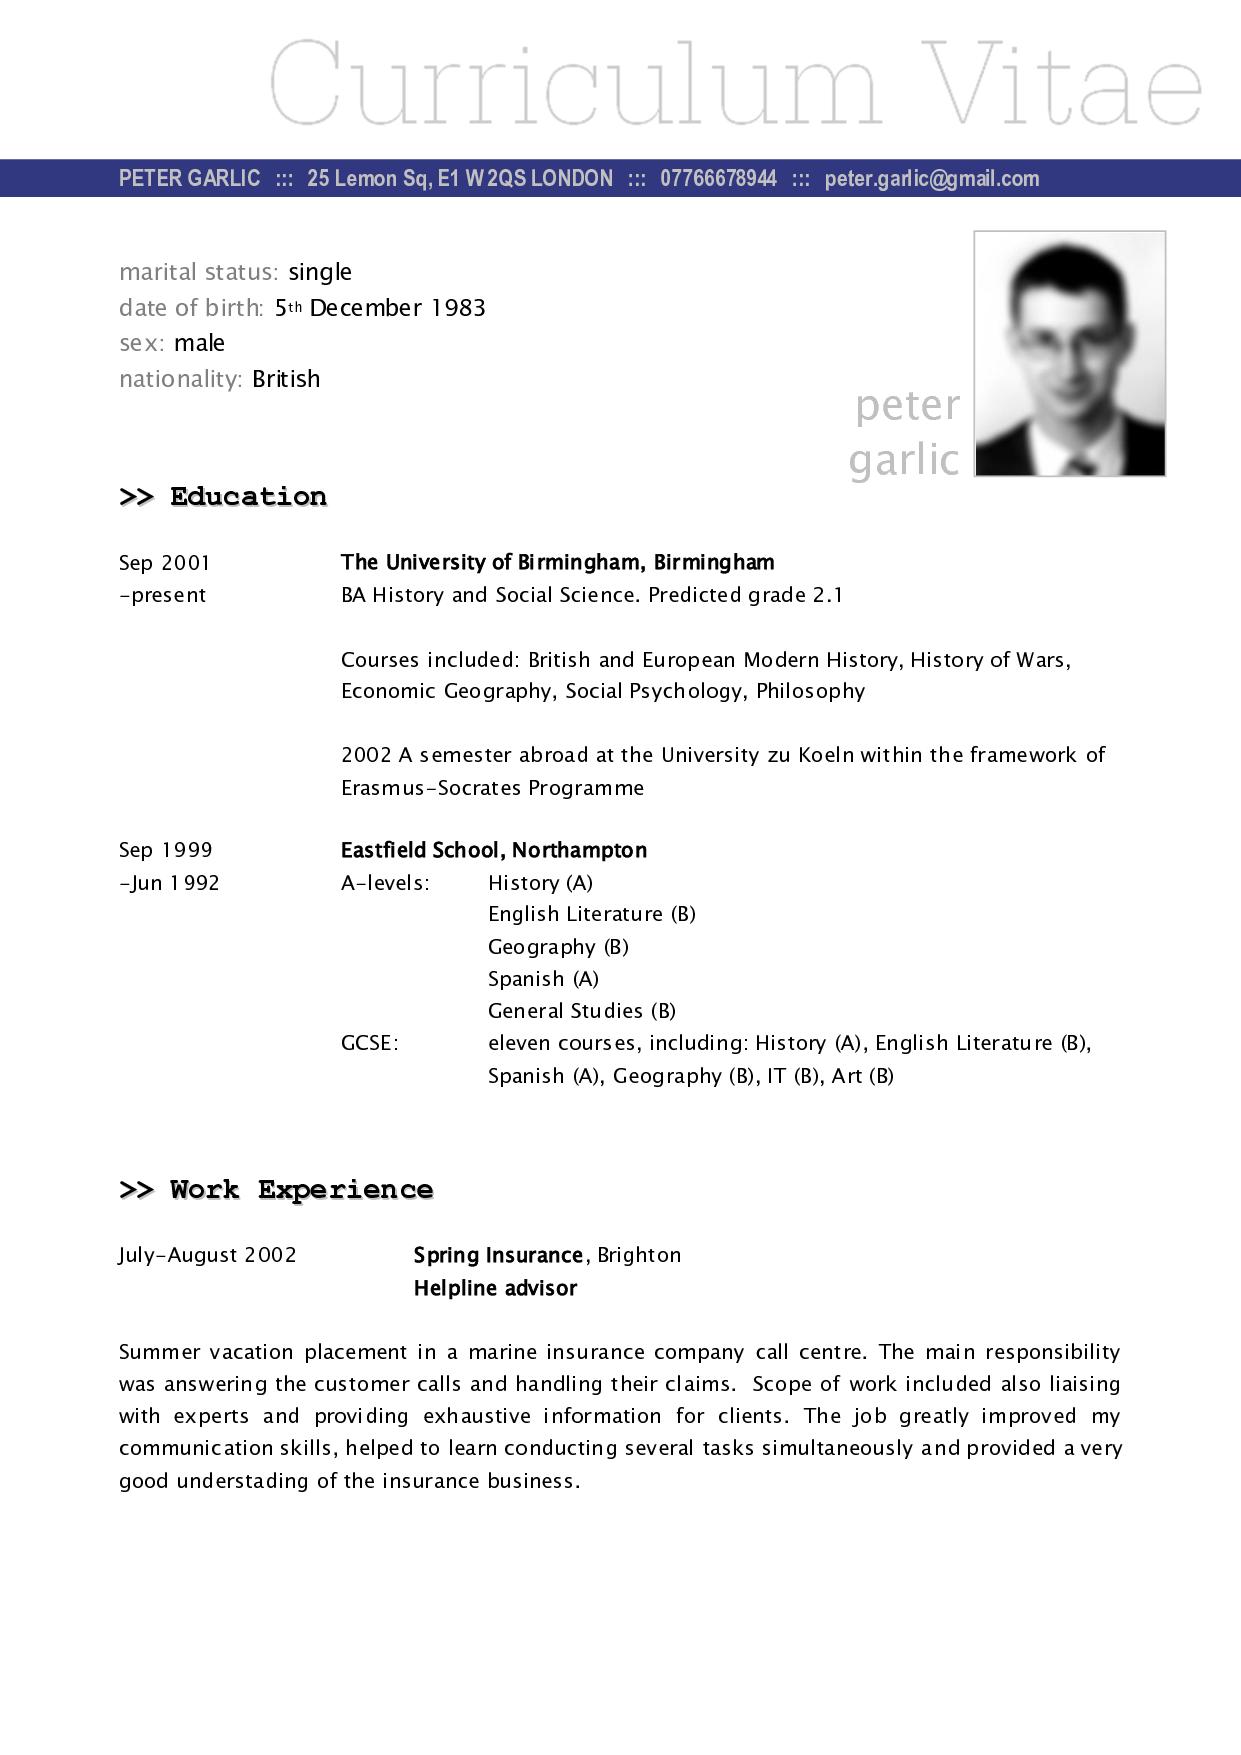 CV Example | Fotolip.com Rich image and wallpaper